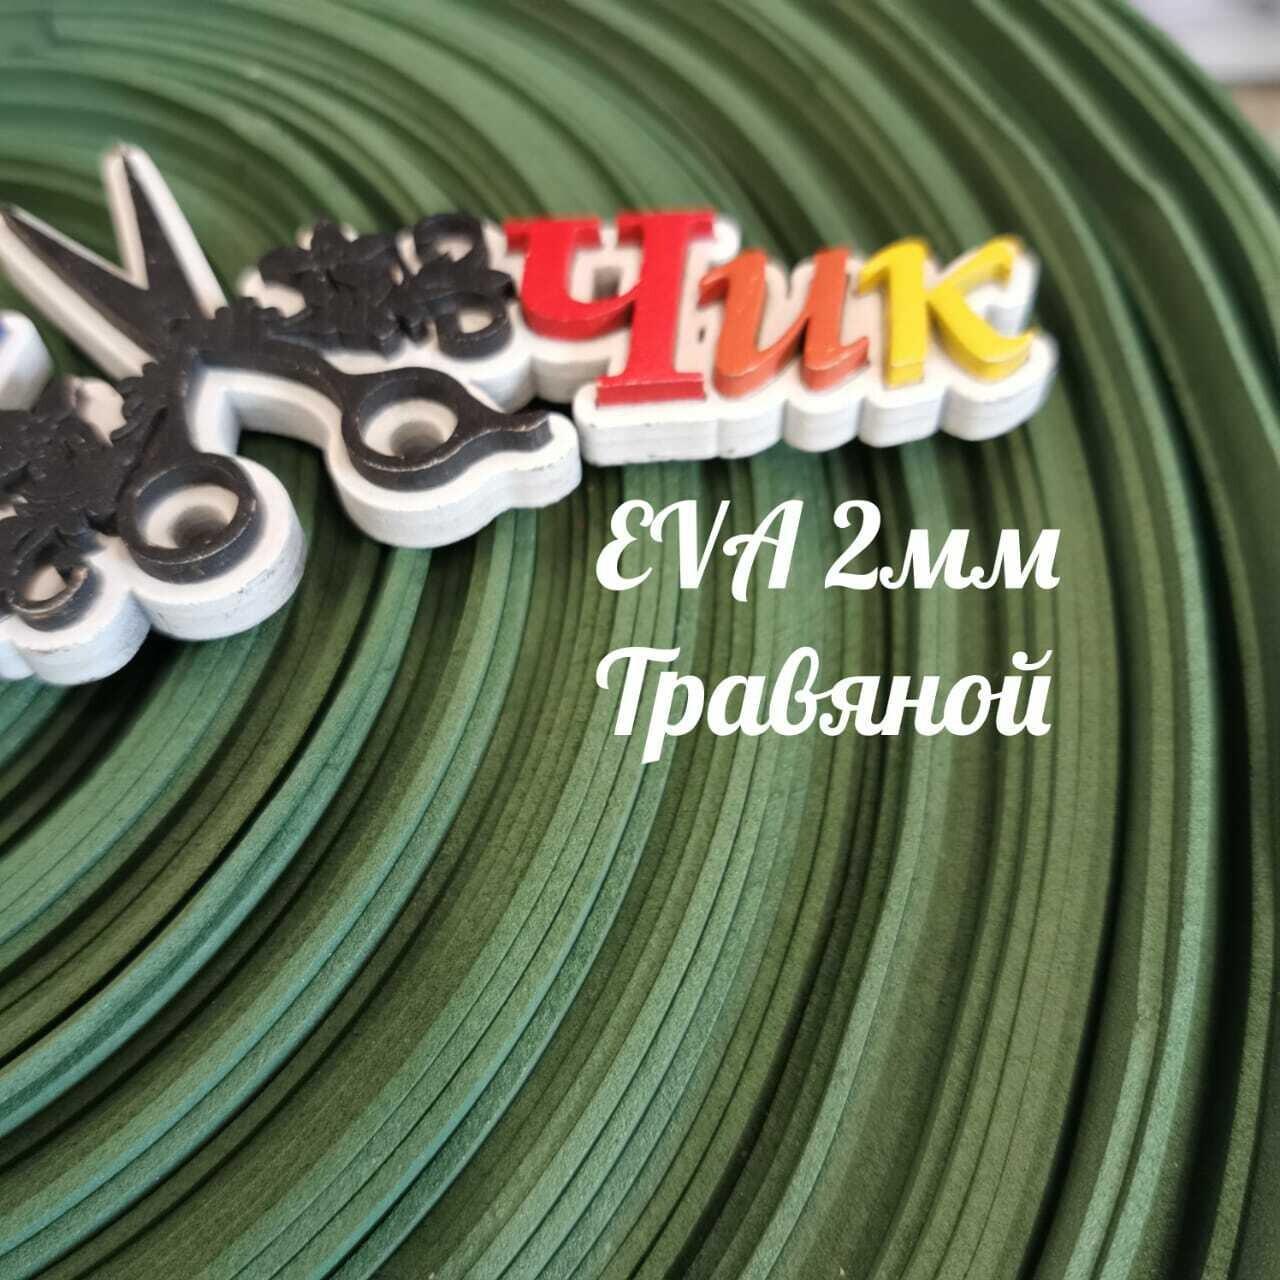 EVA ЛЮКС 2 мм в рулоне (Травяной)